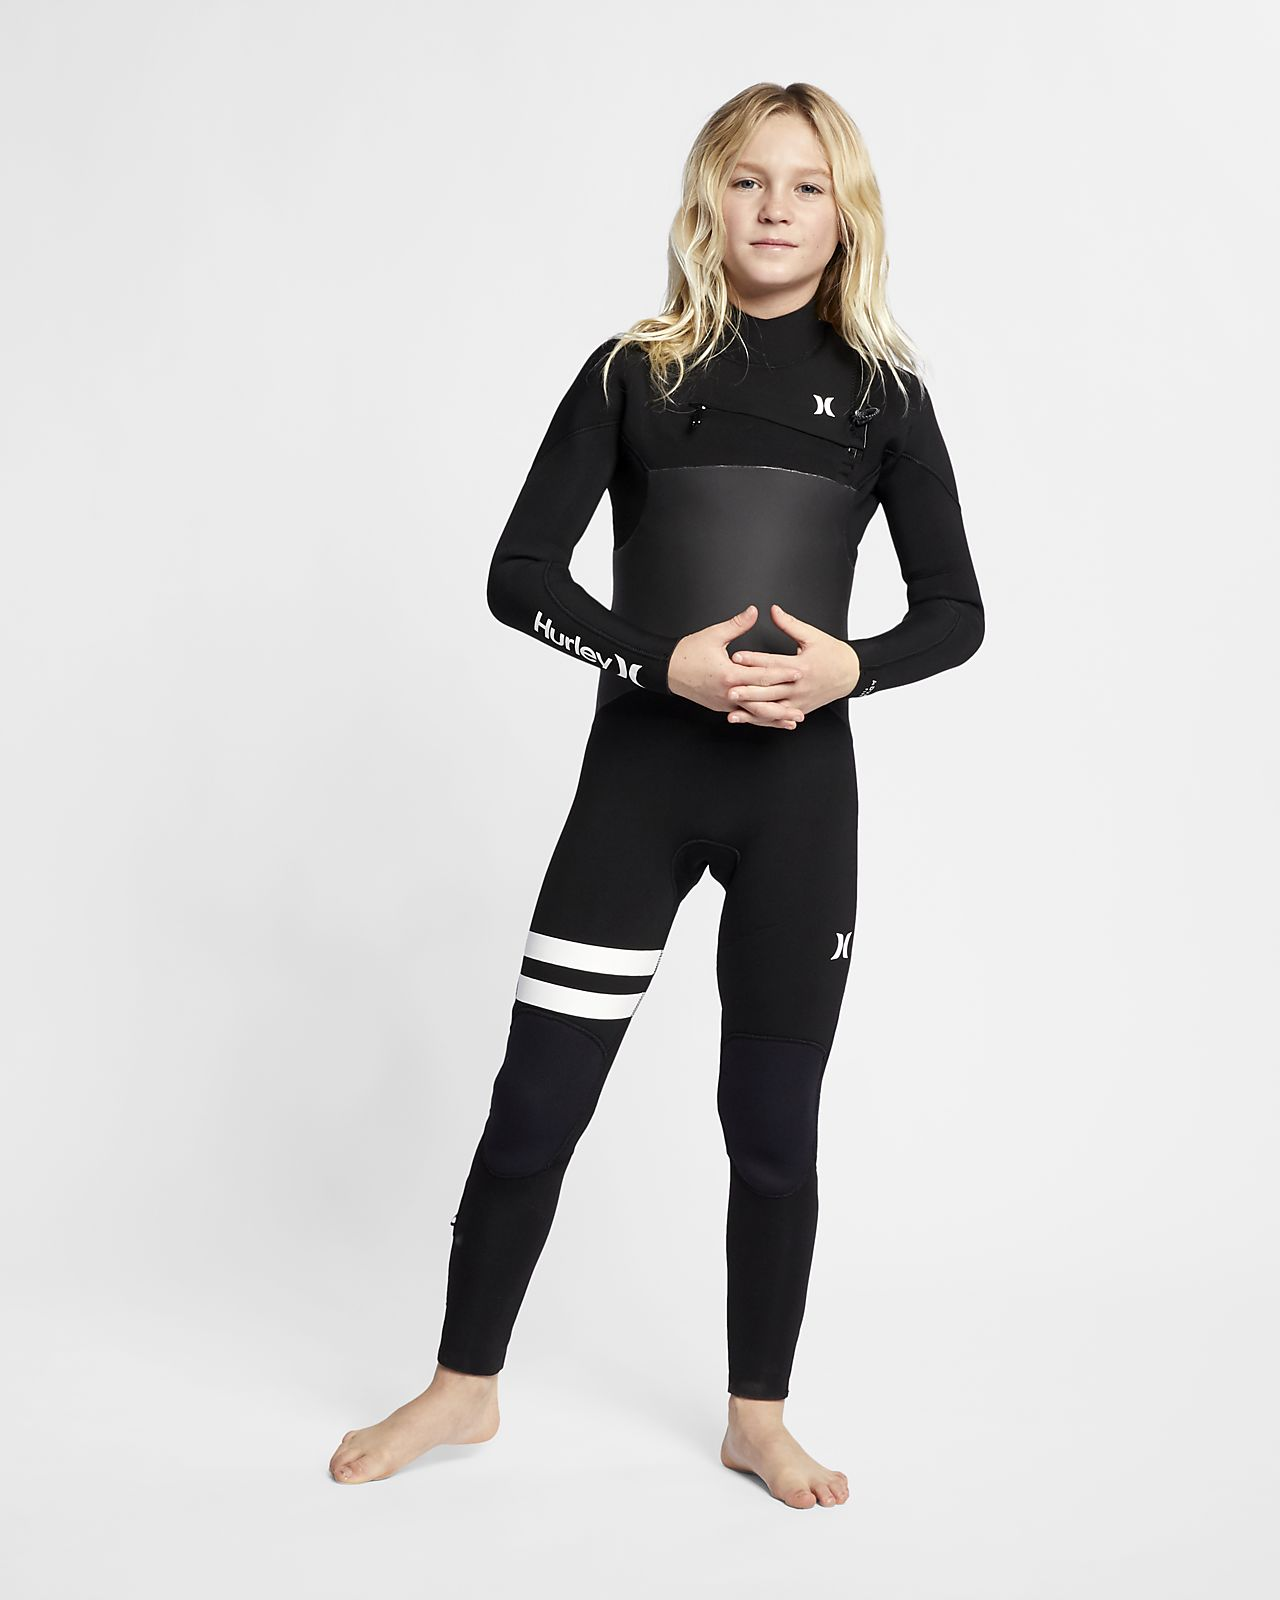 Hurley Advantage Plus 5/3mm Fullsuit Older Kids' (Boys') Wetsuit